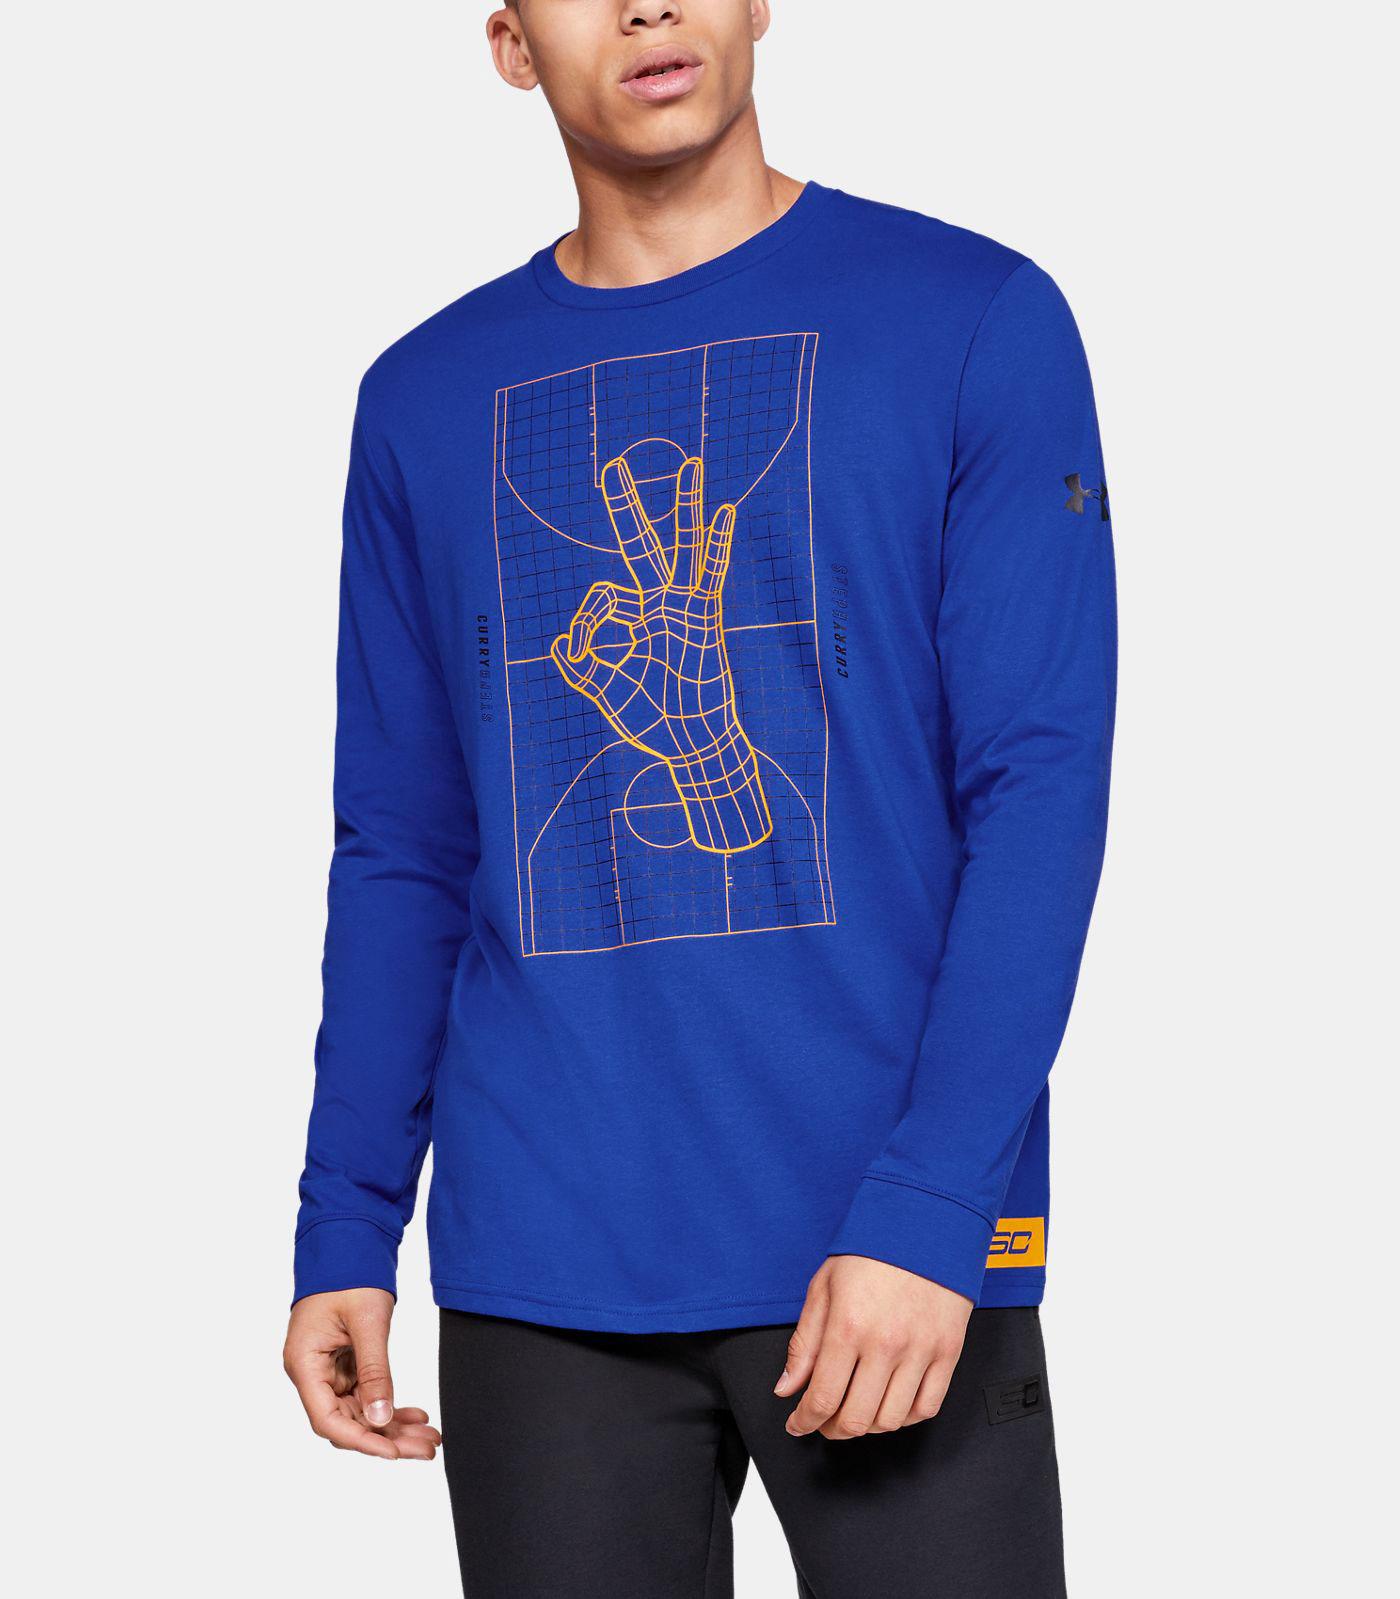 curry-7-dub-nation-shirt